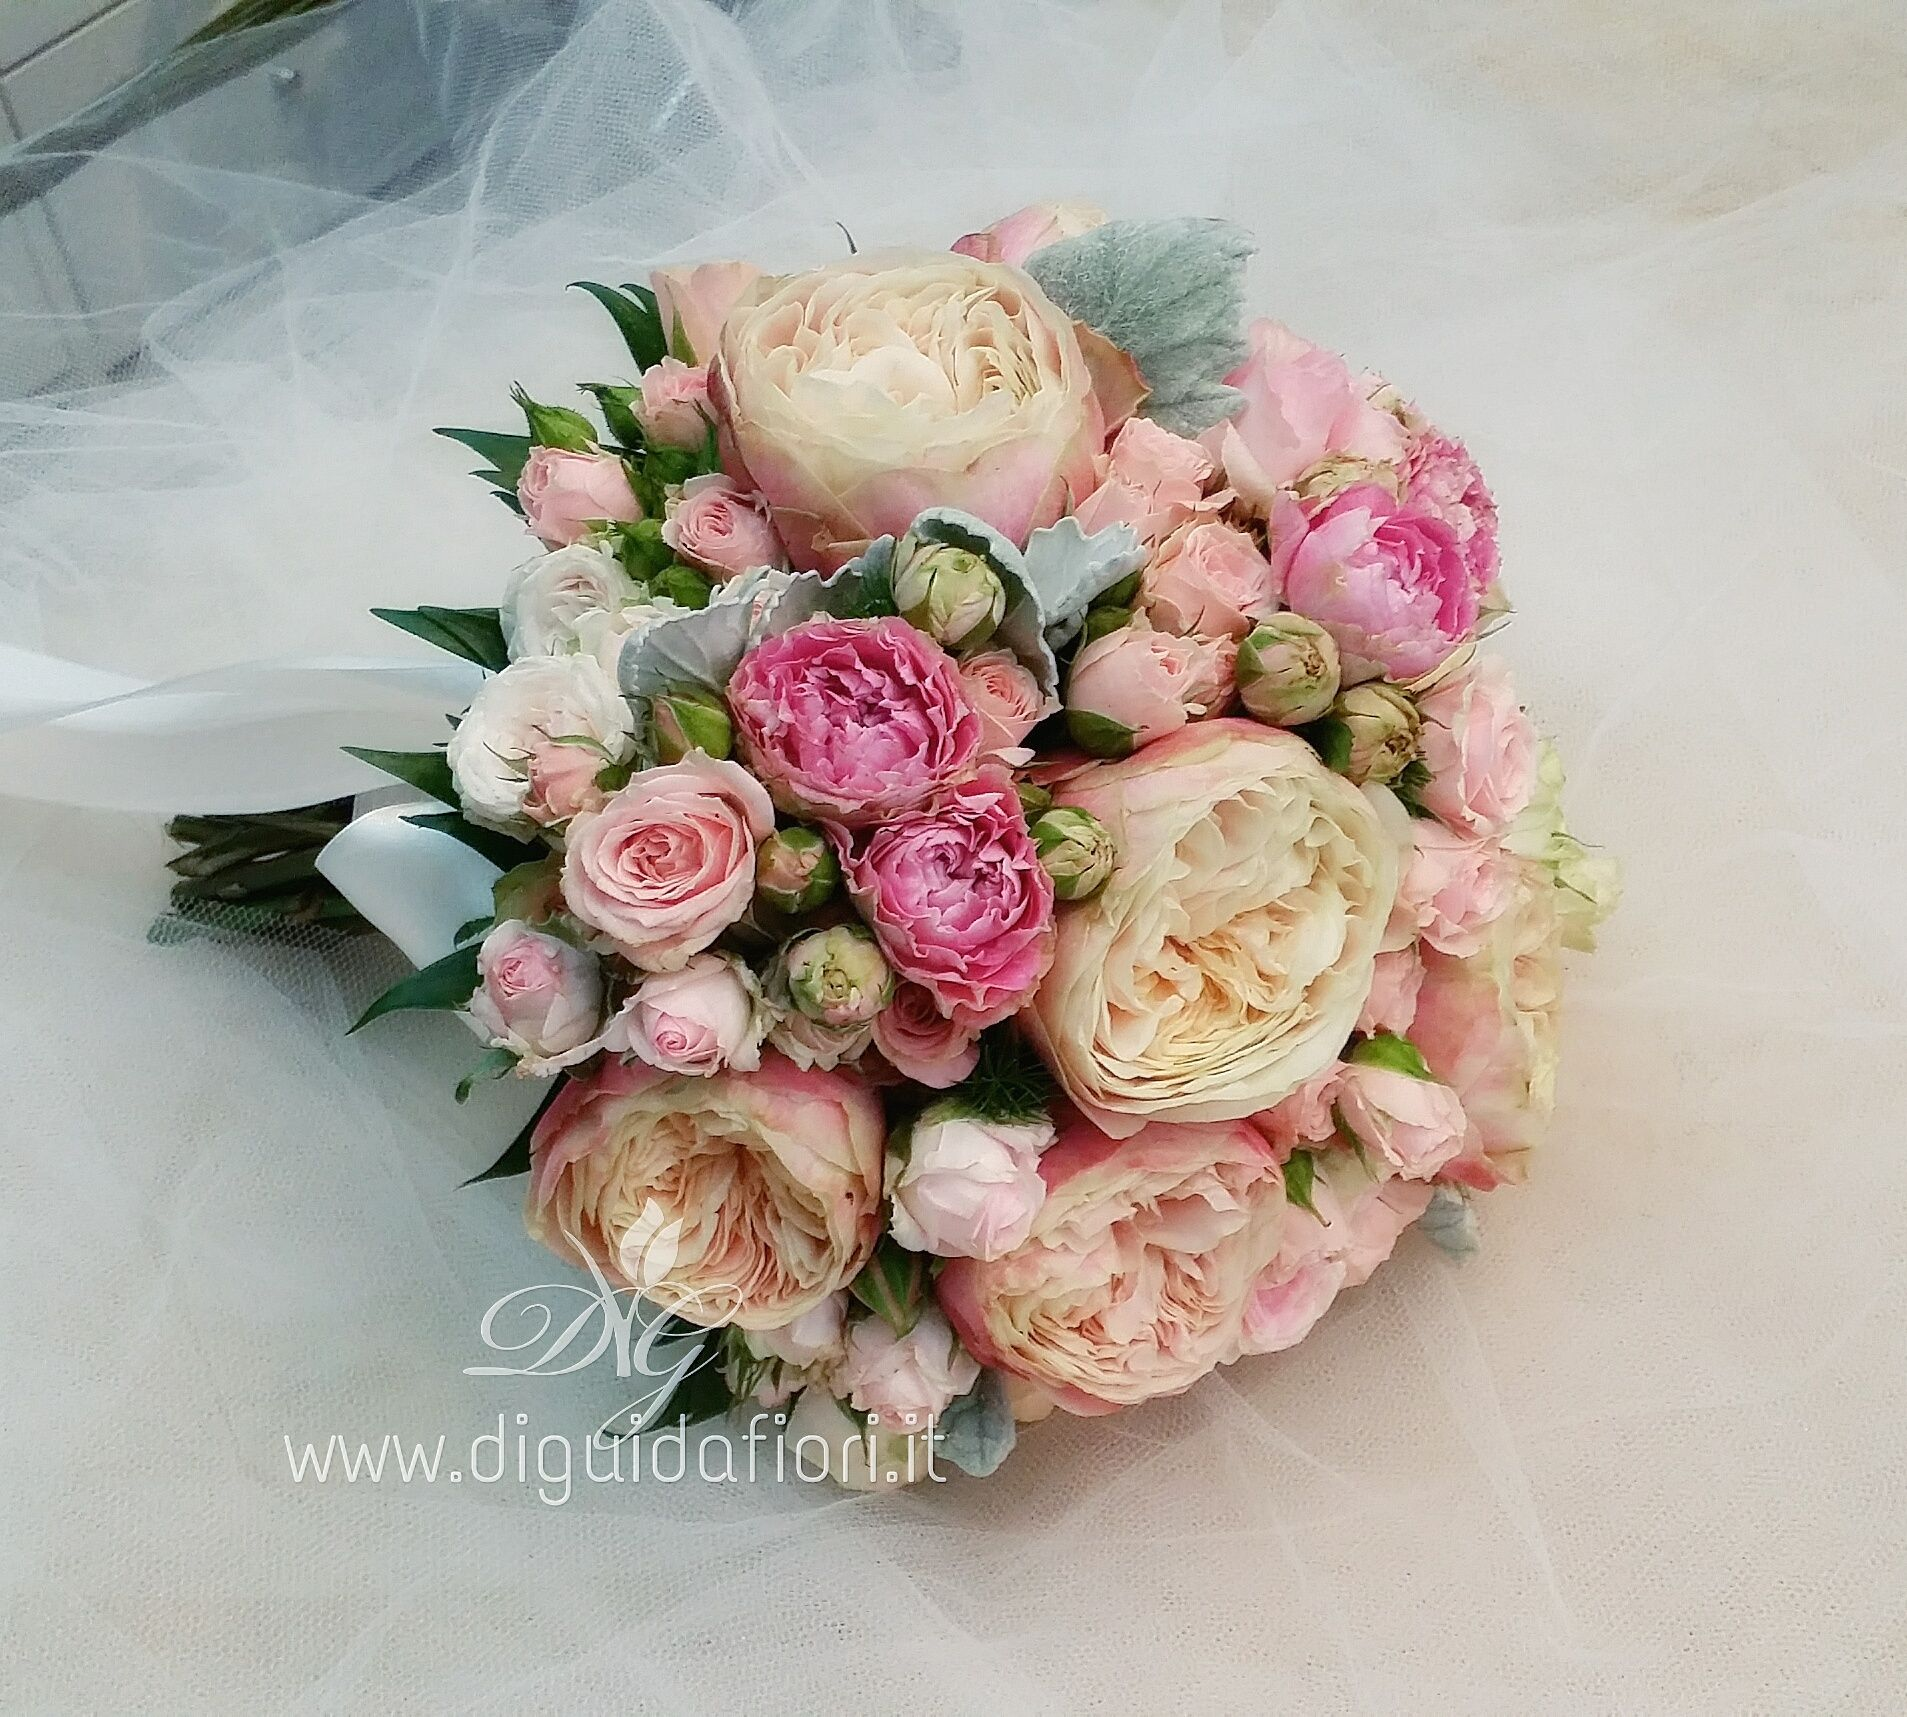 Bouquet Sposa In Inglese.Bouquet Da Sposa Con Rose Inglesi Bridal Bouquet English Roses